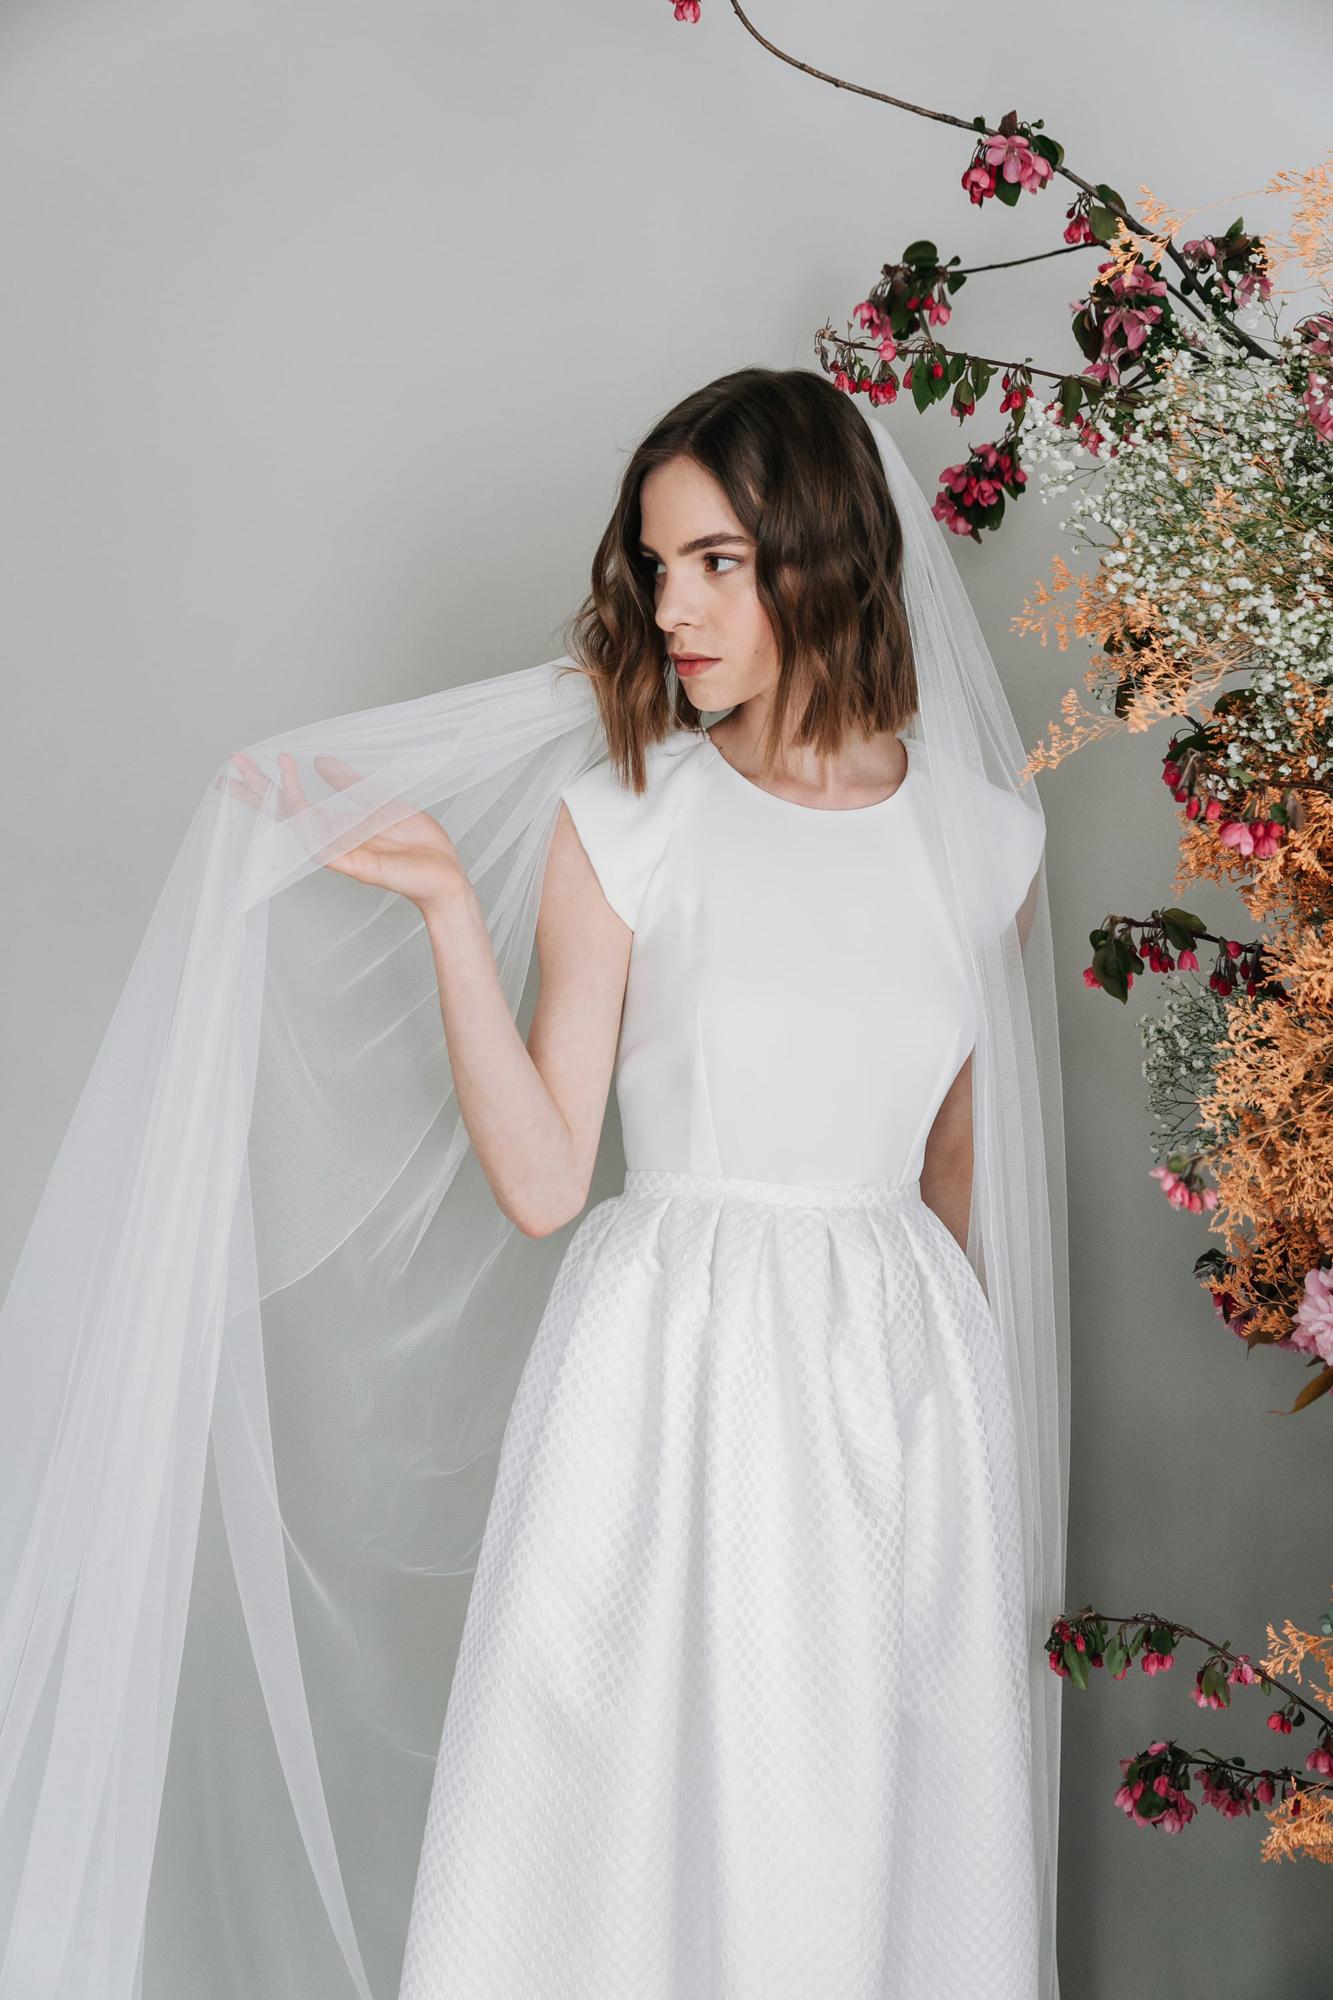 Kate-Beaumont-Sheffield-Zinnia-Modern-Wedding-Gown-Polka-Dot-Pleated-Skirt-1.jpg